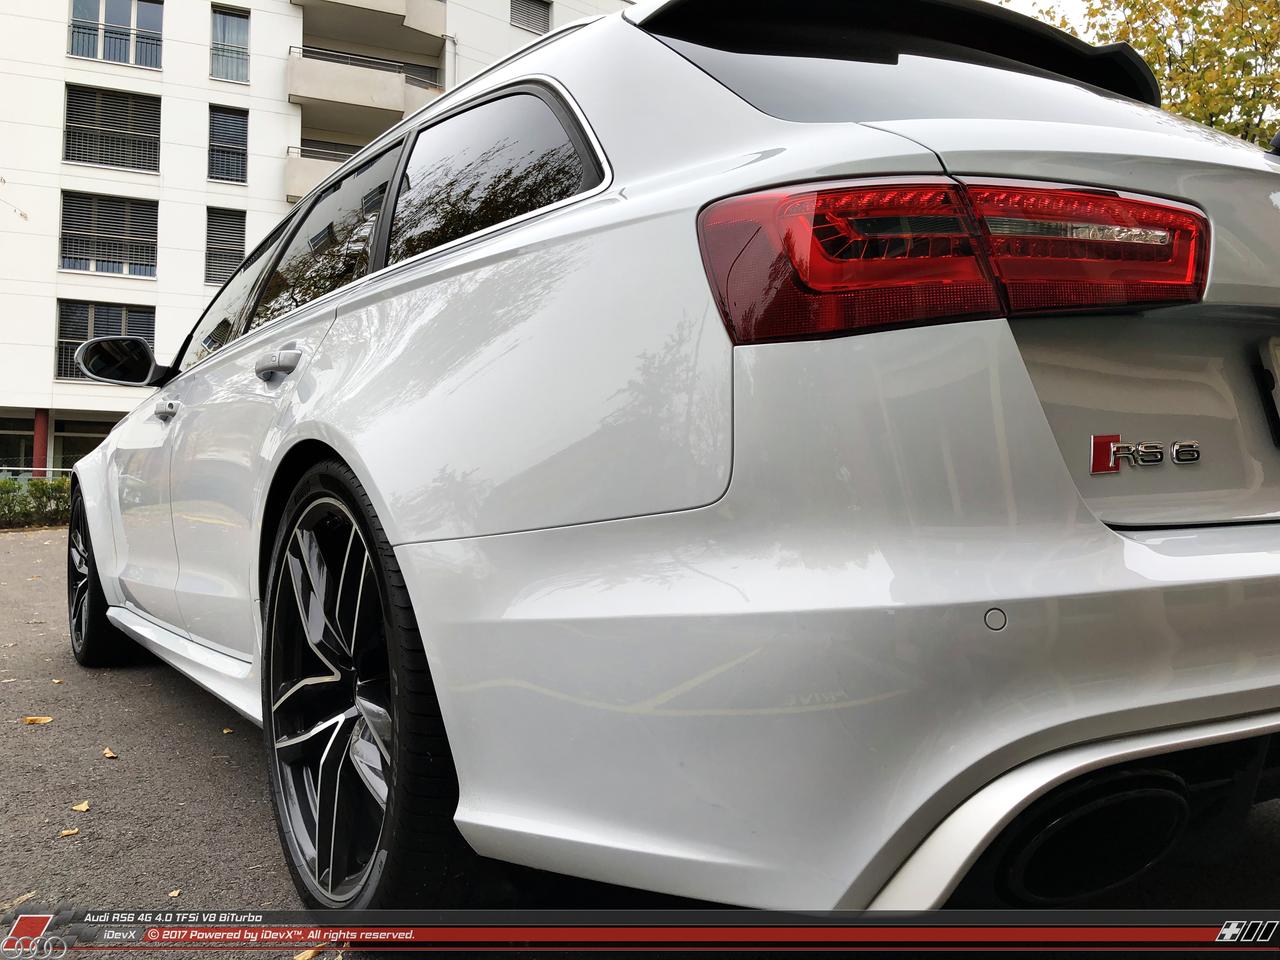 10_11.2018_Audi-RS6_iDevX_030.png